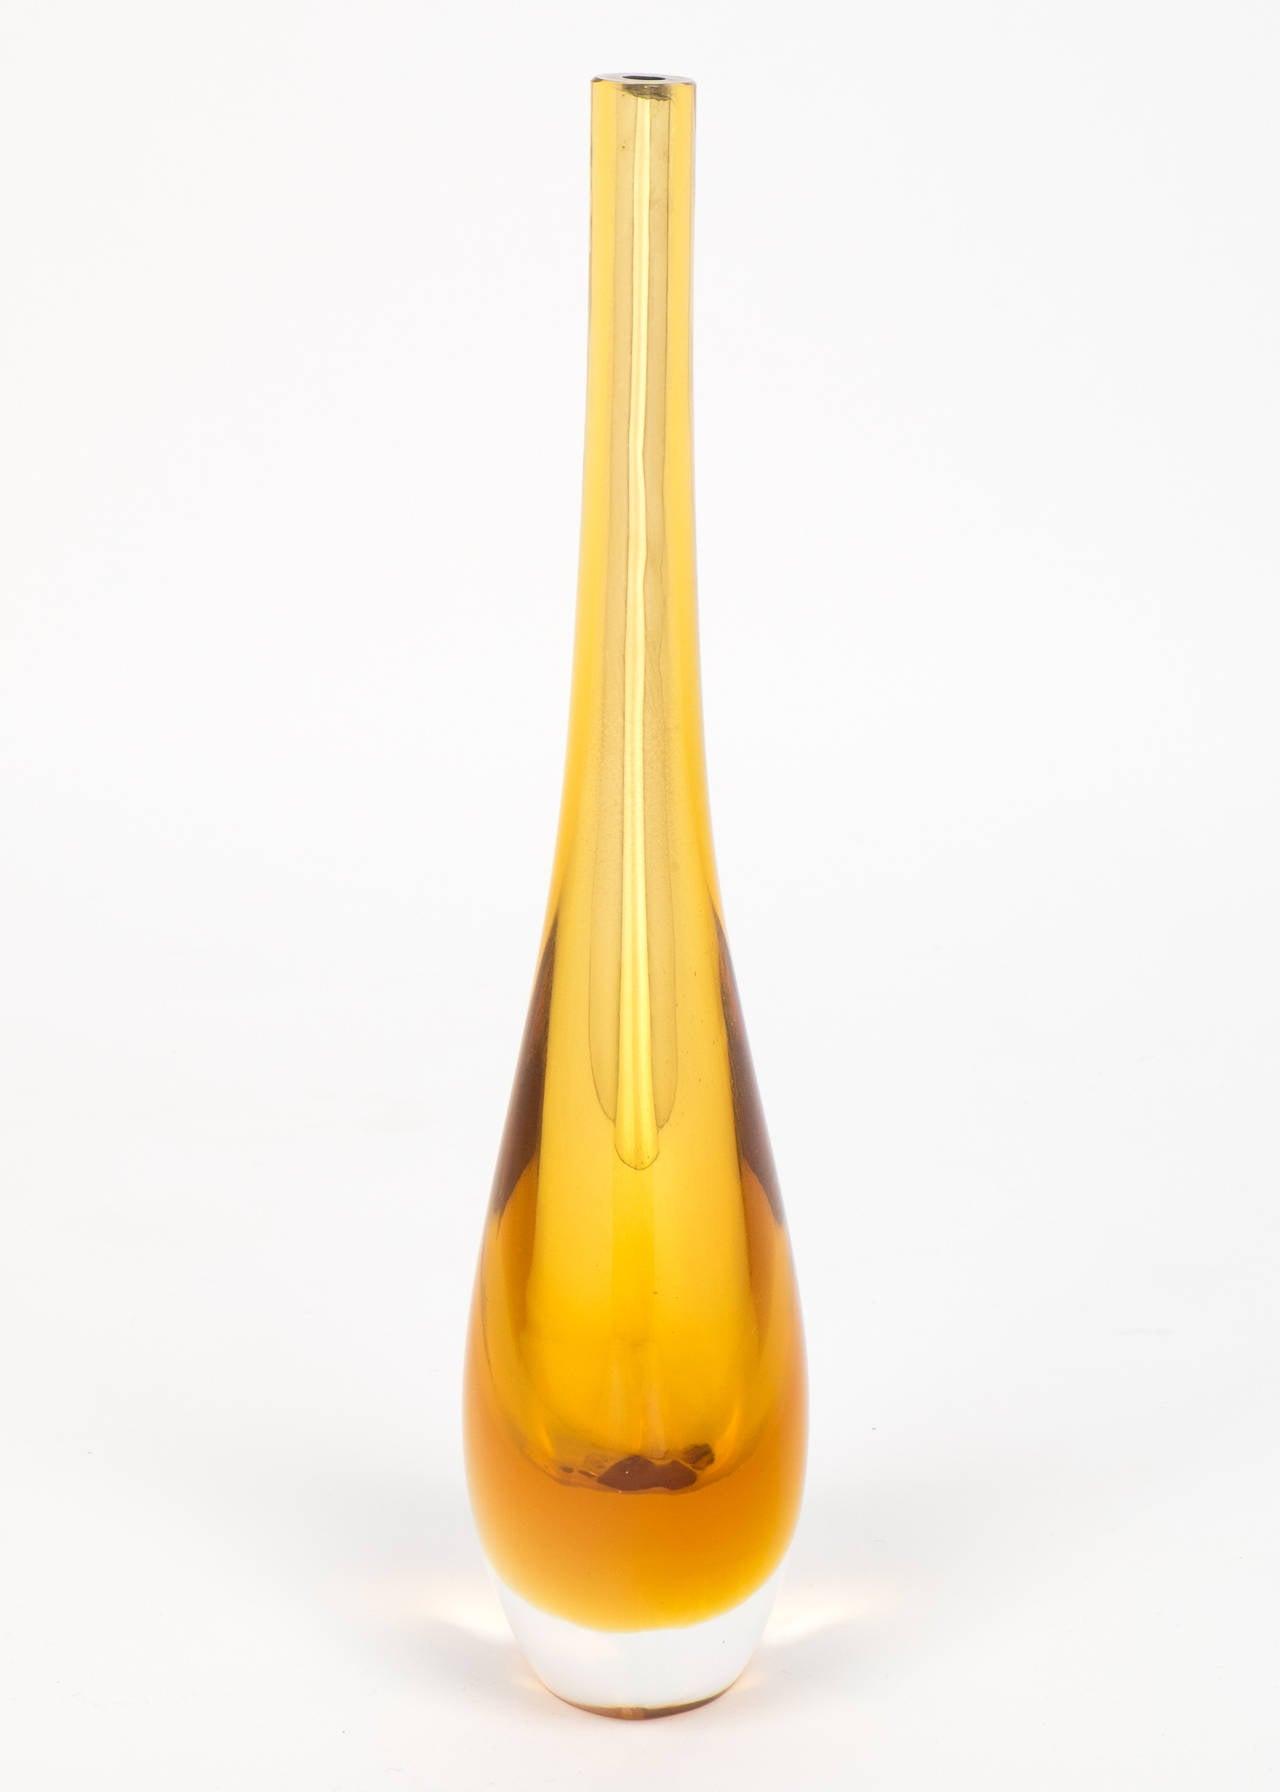 Murano amber glass single stem vases for sale at 1stdibs murano amber glass single stem vases for sale 1 reviewsmspy